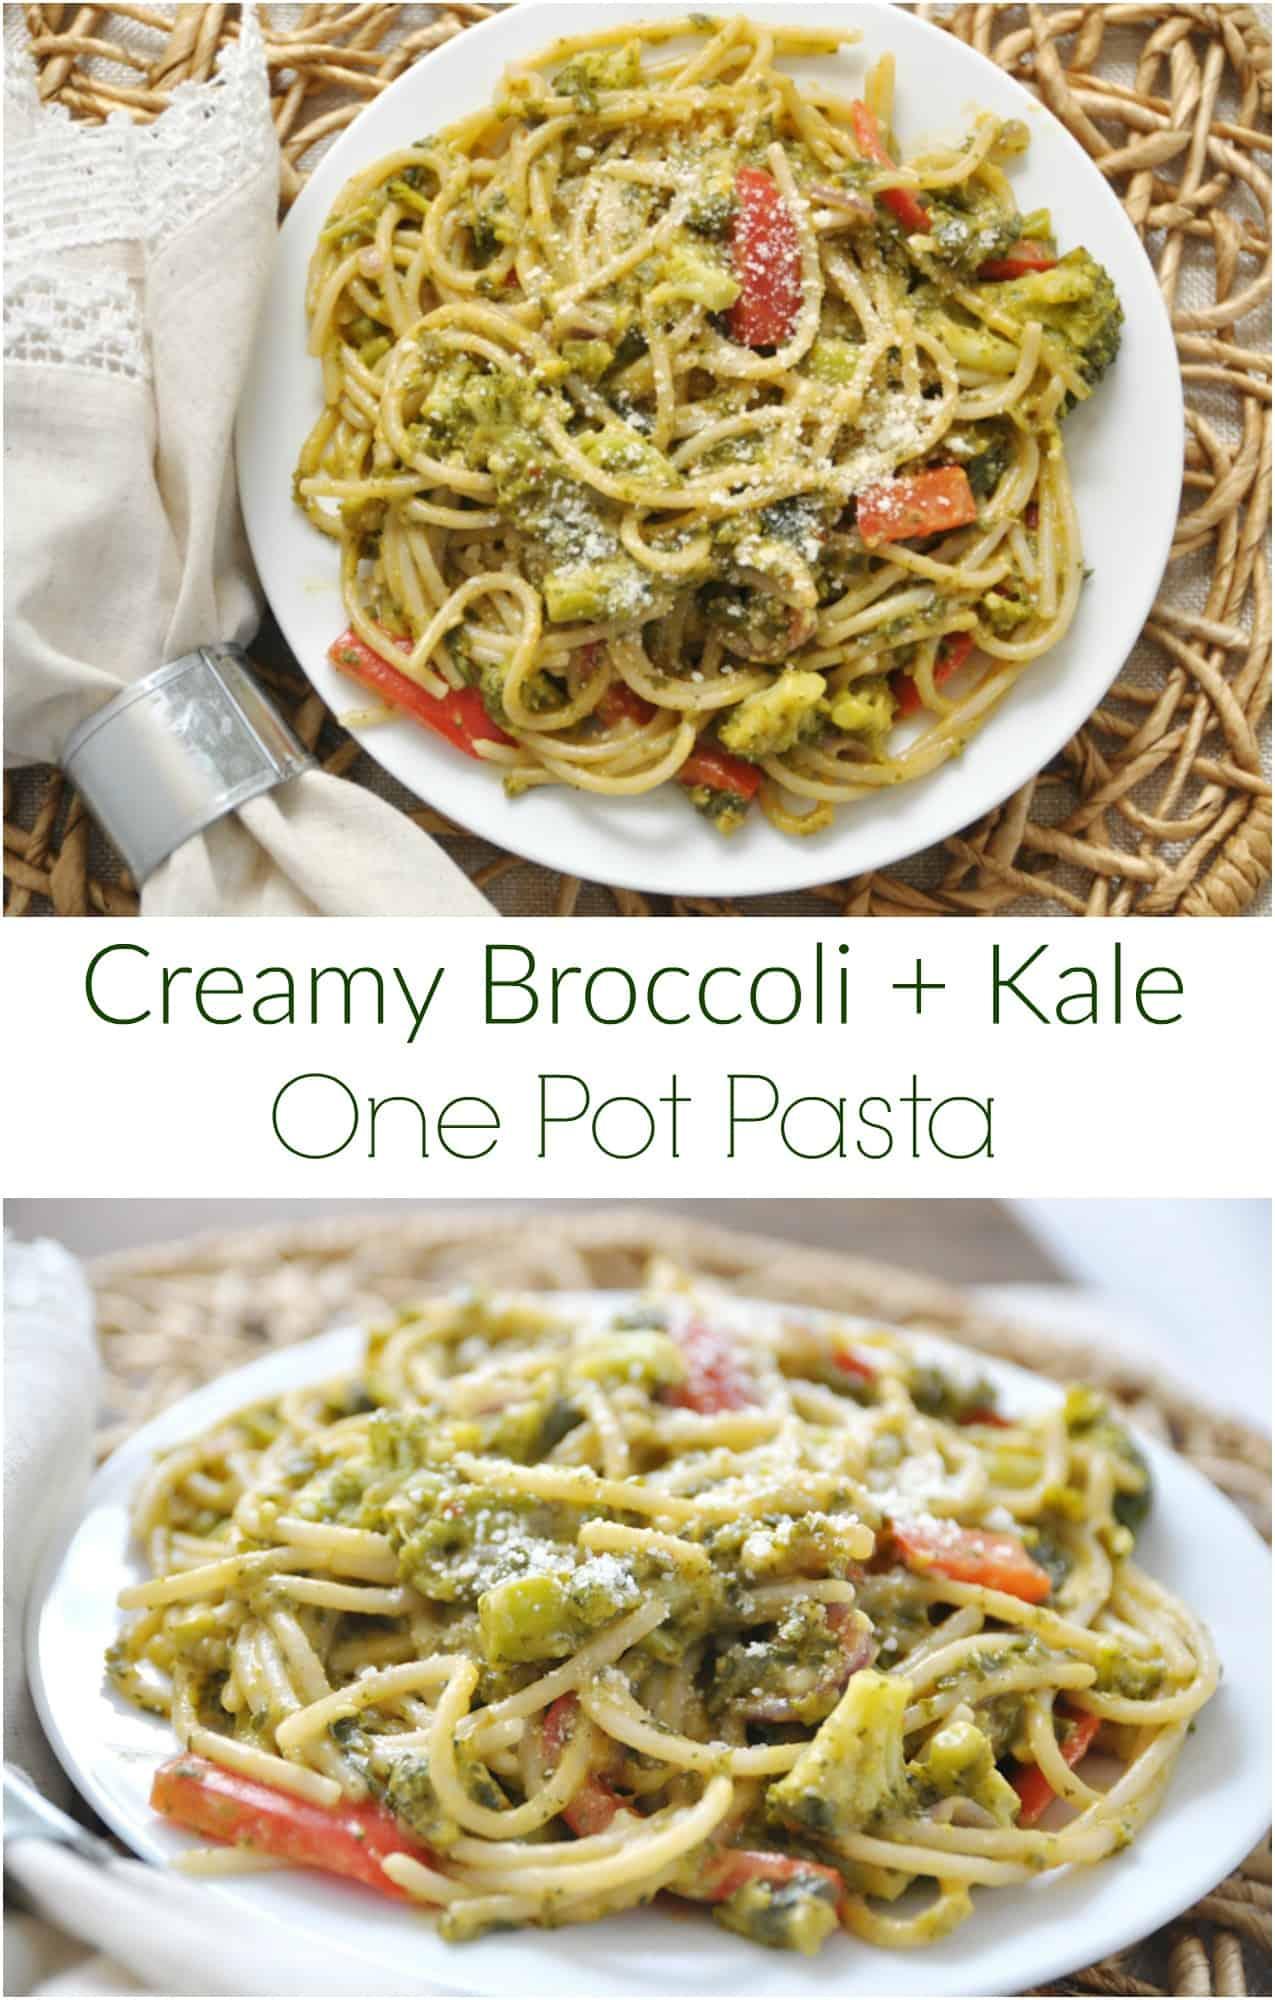 Creamy Borccoli Kale One Pot Pasta